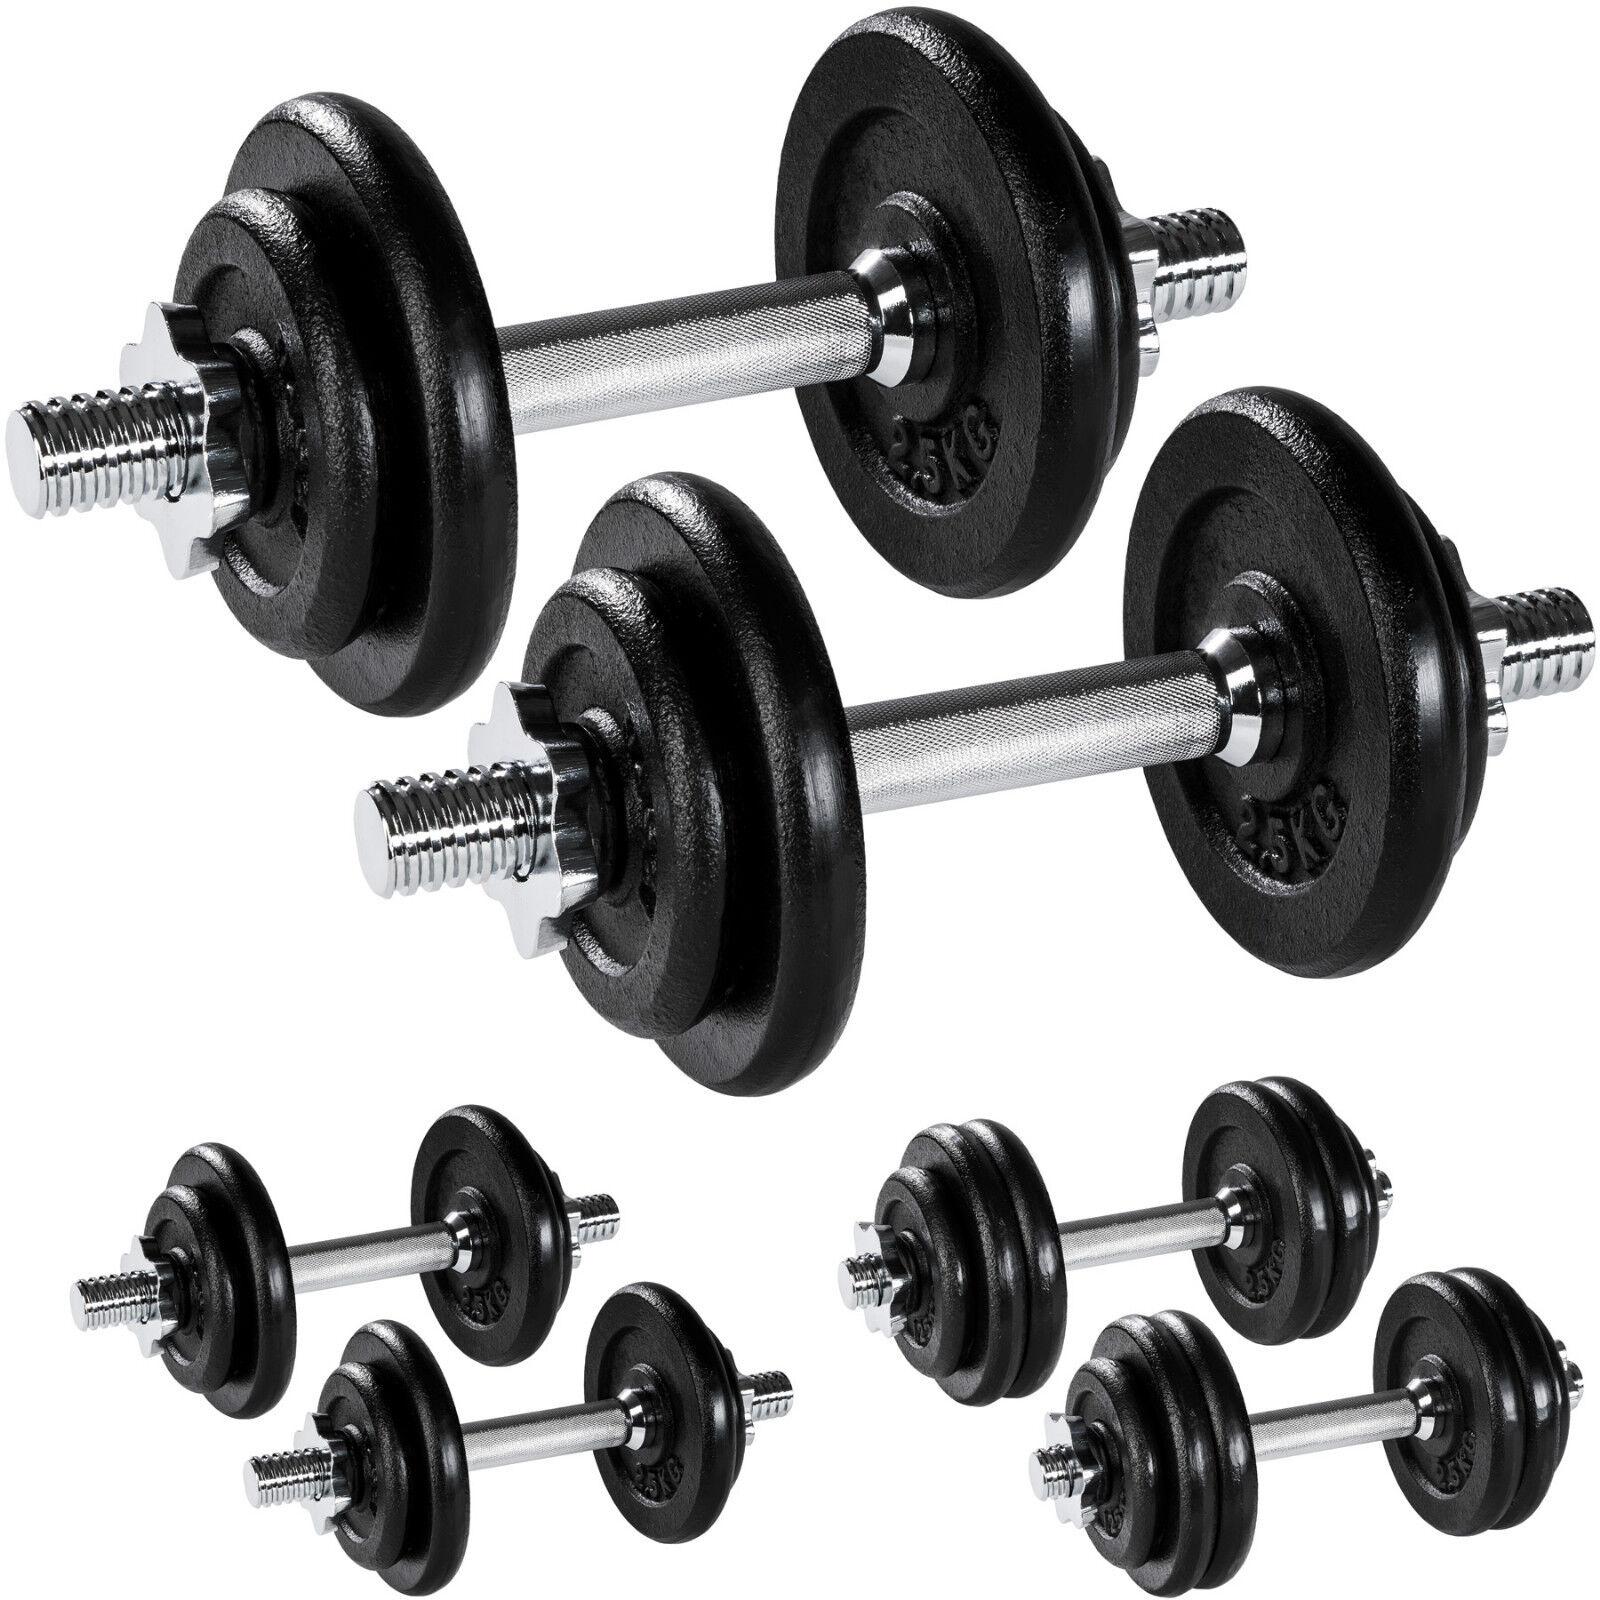 Manubri Set pesi allenamento esercizi fitness GHISA Bicipiti Allenamento Palestra